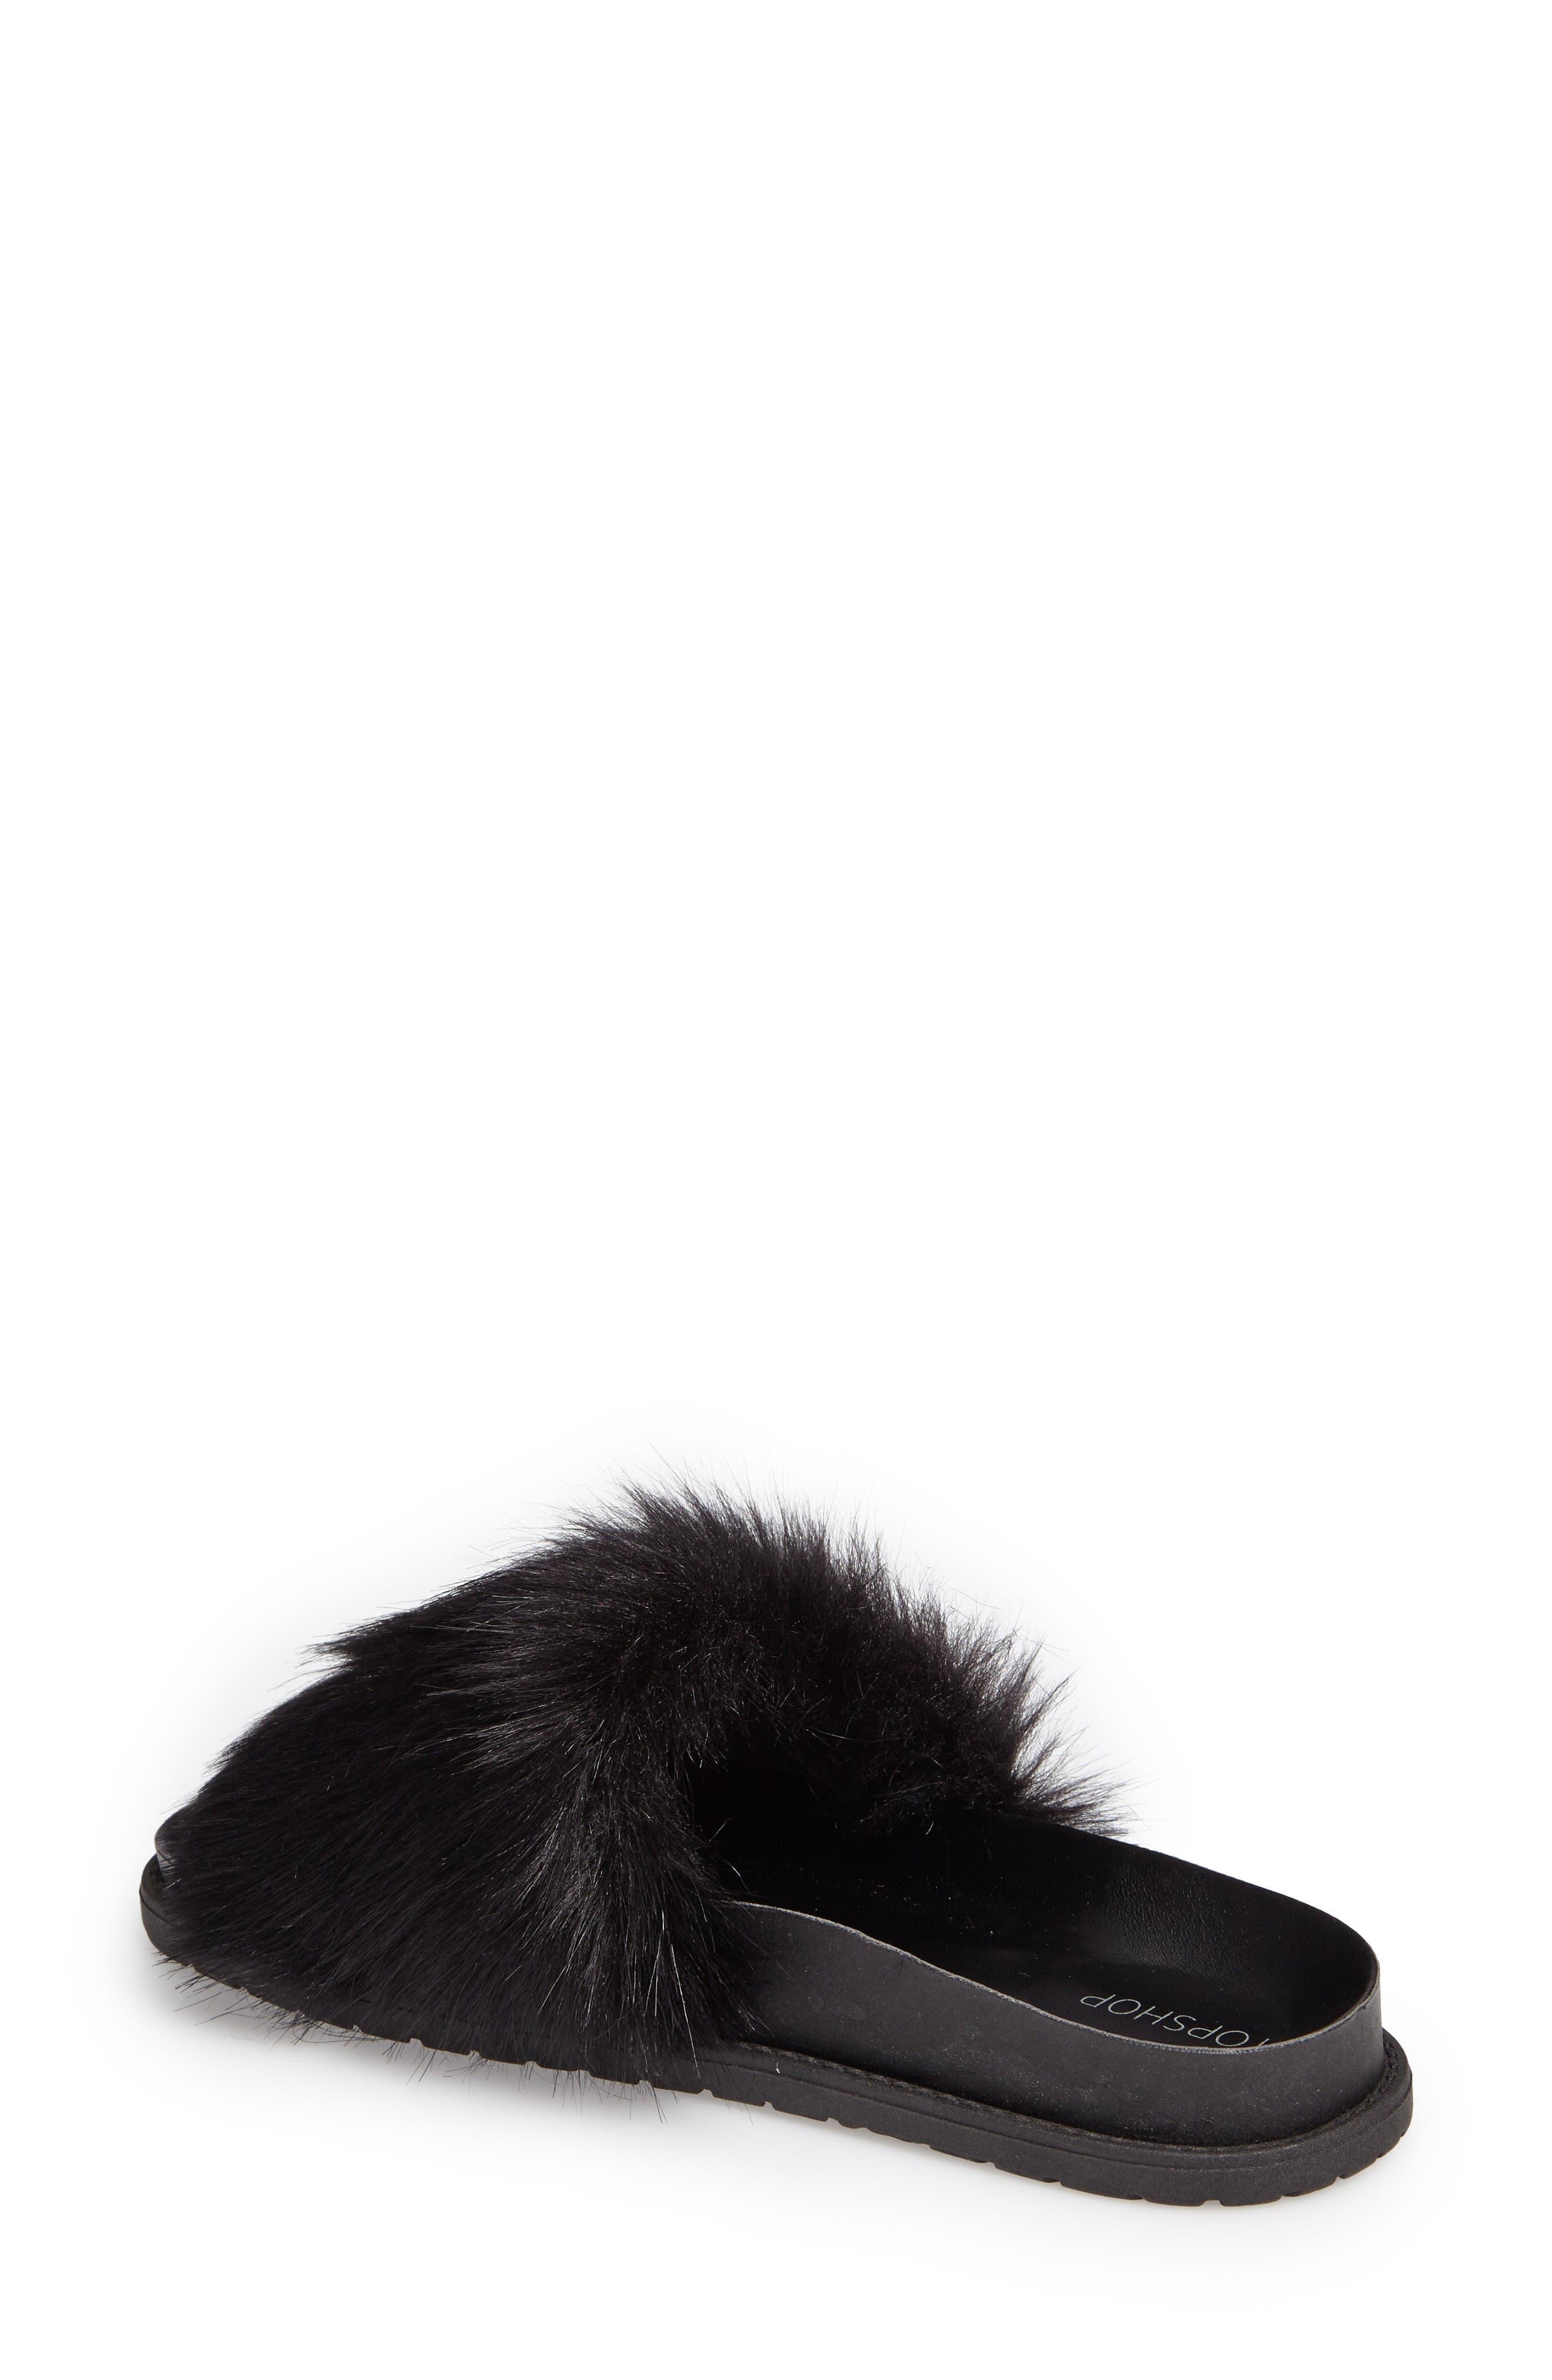 Alternate Image 2  - Topshop Faux Fur Slide Sandal (Women)